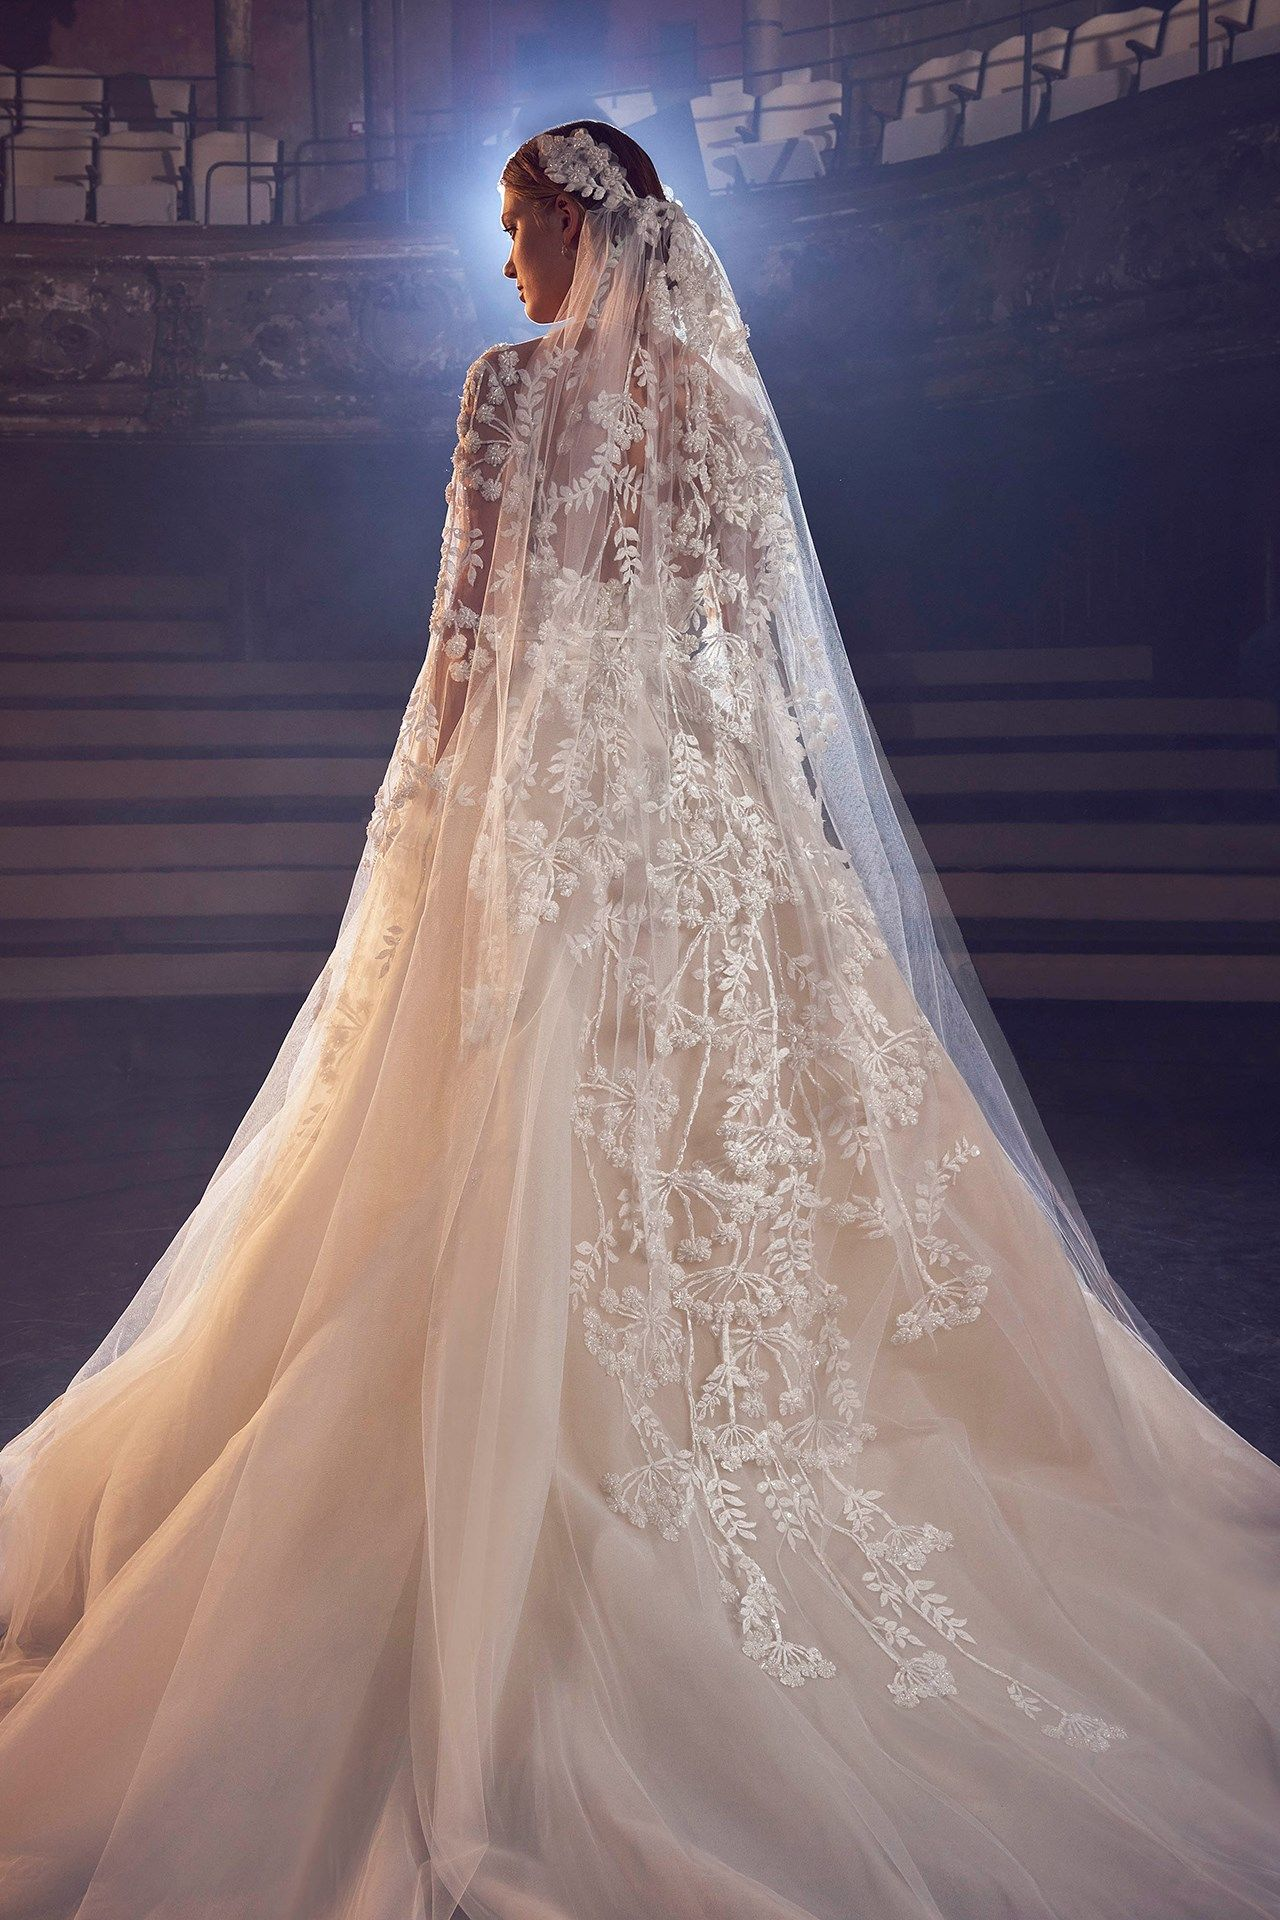 Braut kollektion Elie Saab Herbst 17: couture-traum  Gelinlik